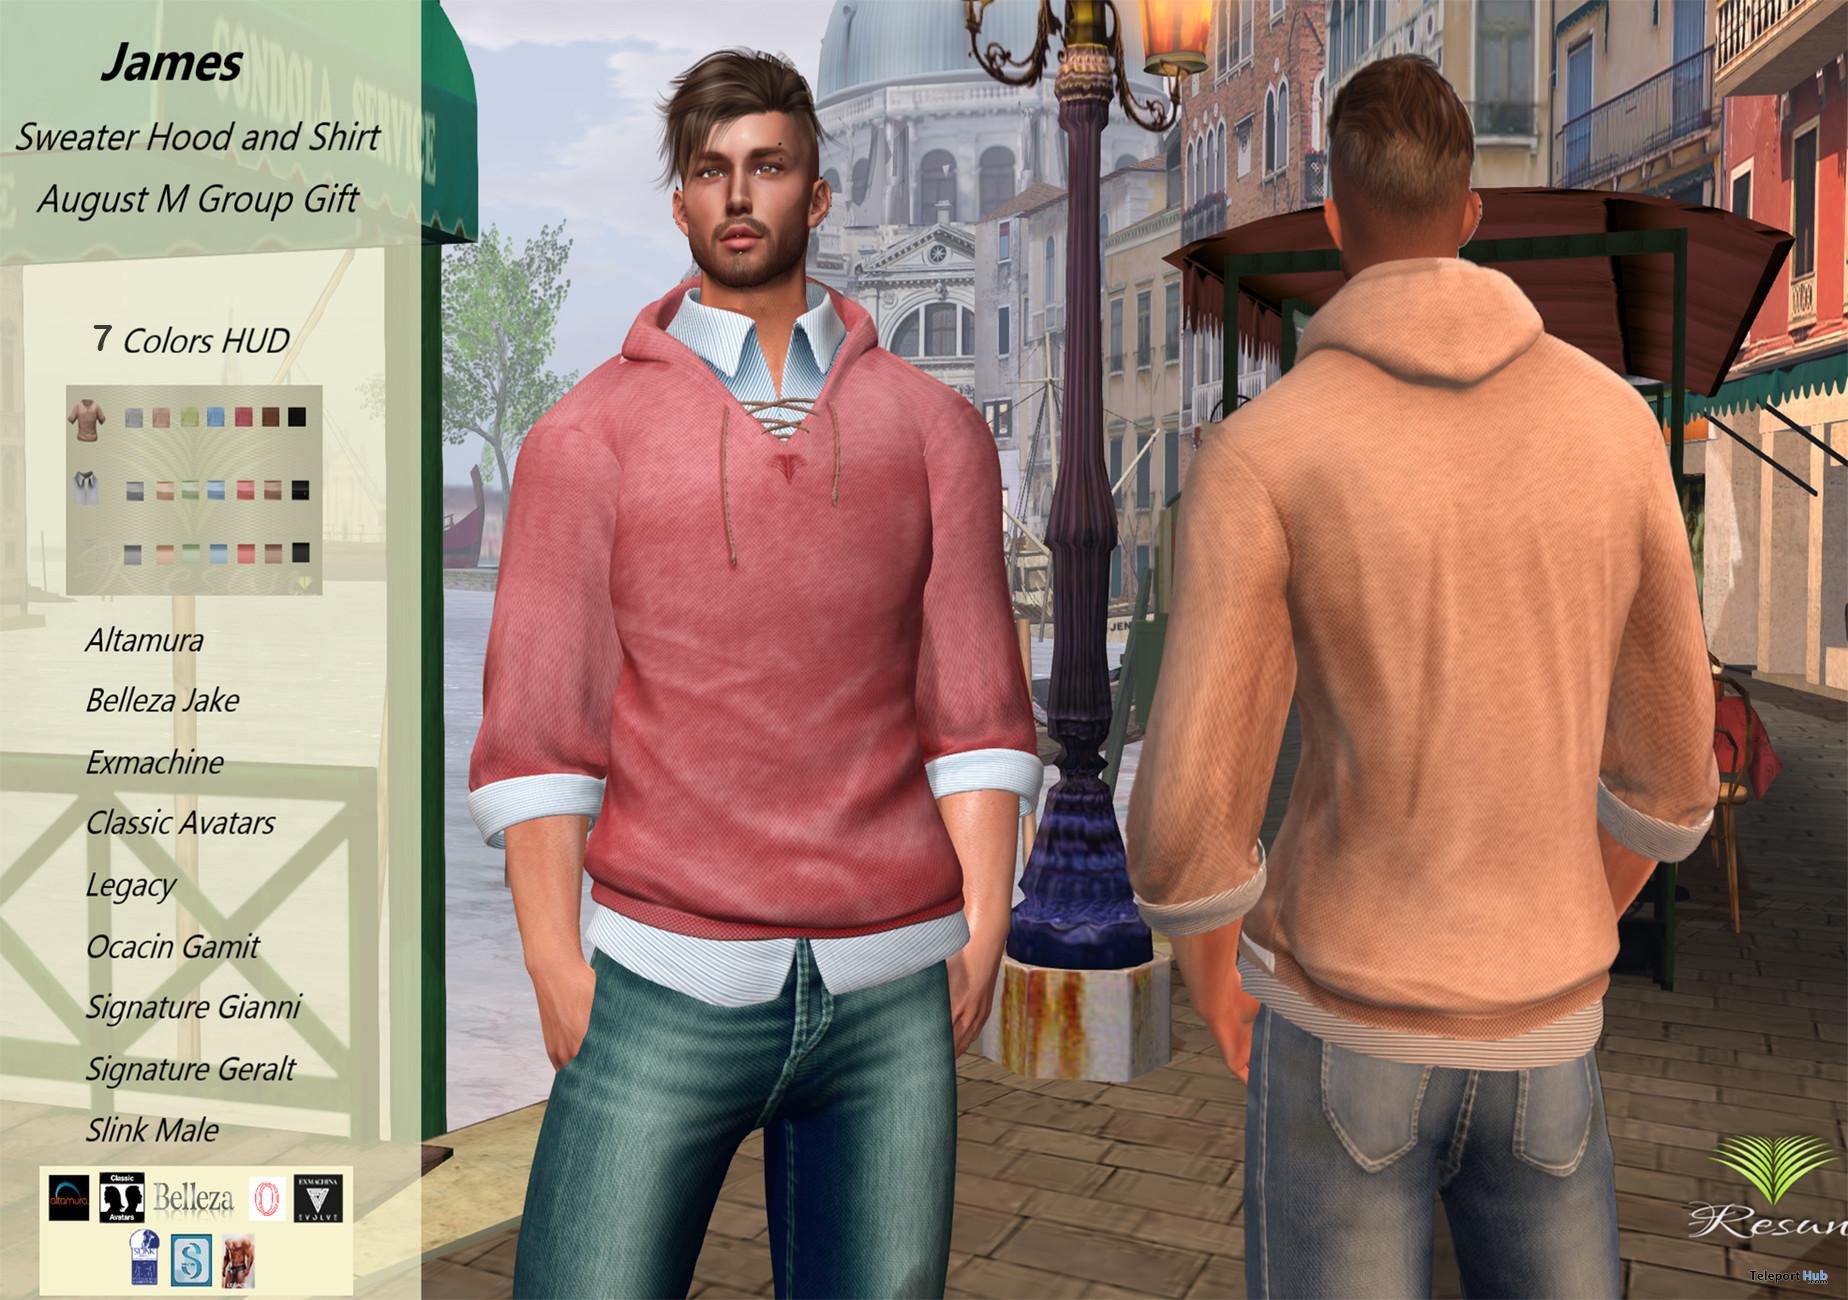 James Sweater Hood & Shirt August 2021 Group Gift by Resun Fashion Store - Teleport Hub - teleporthub.com